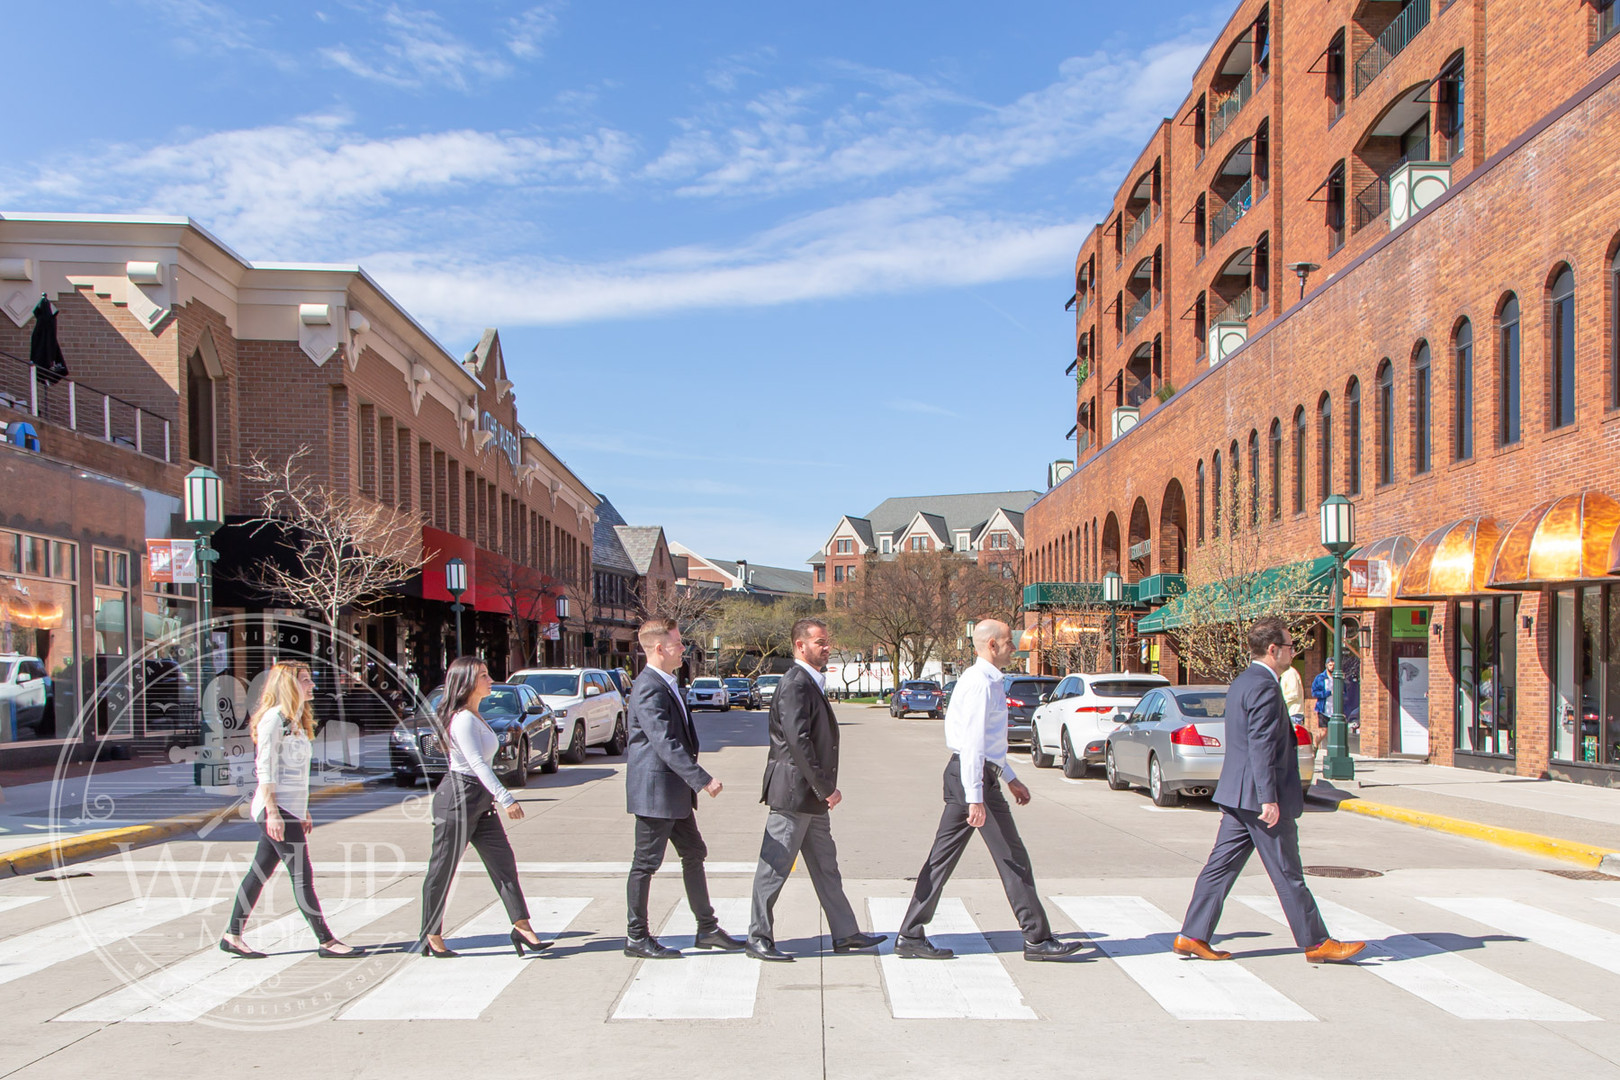 KW Domain Abbey Road - img_7301.jpg